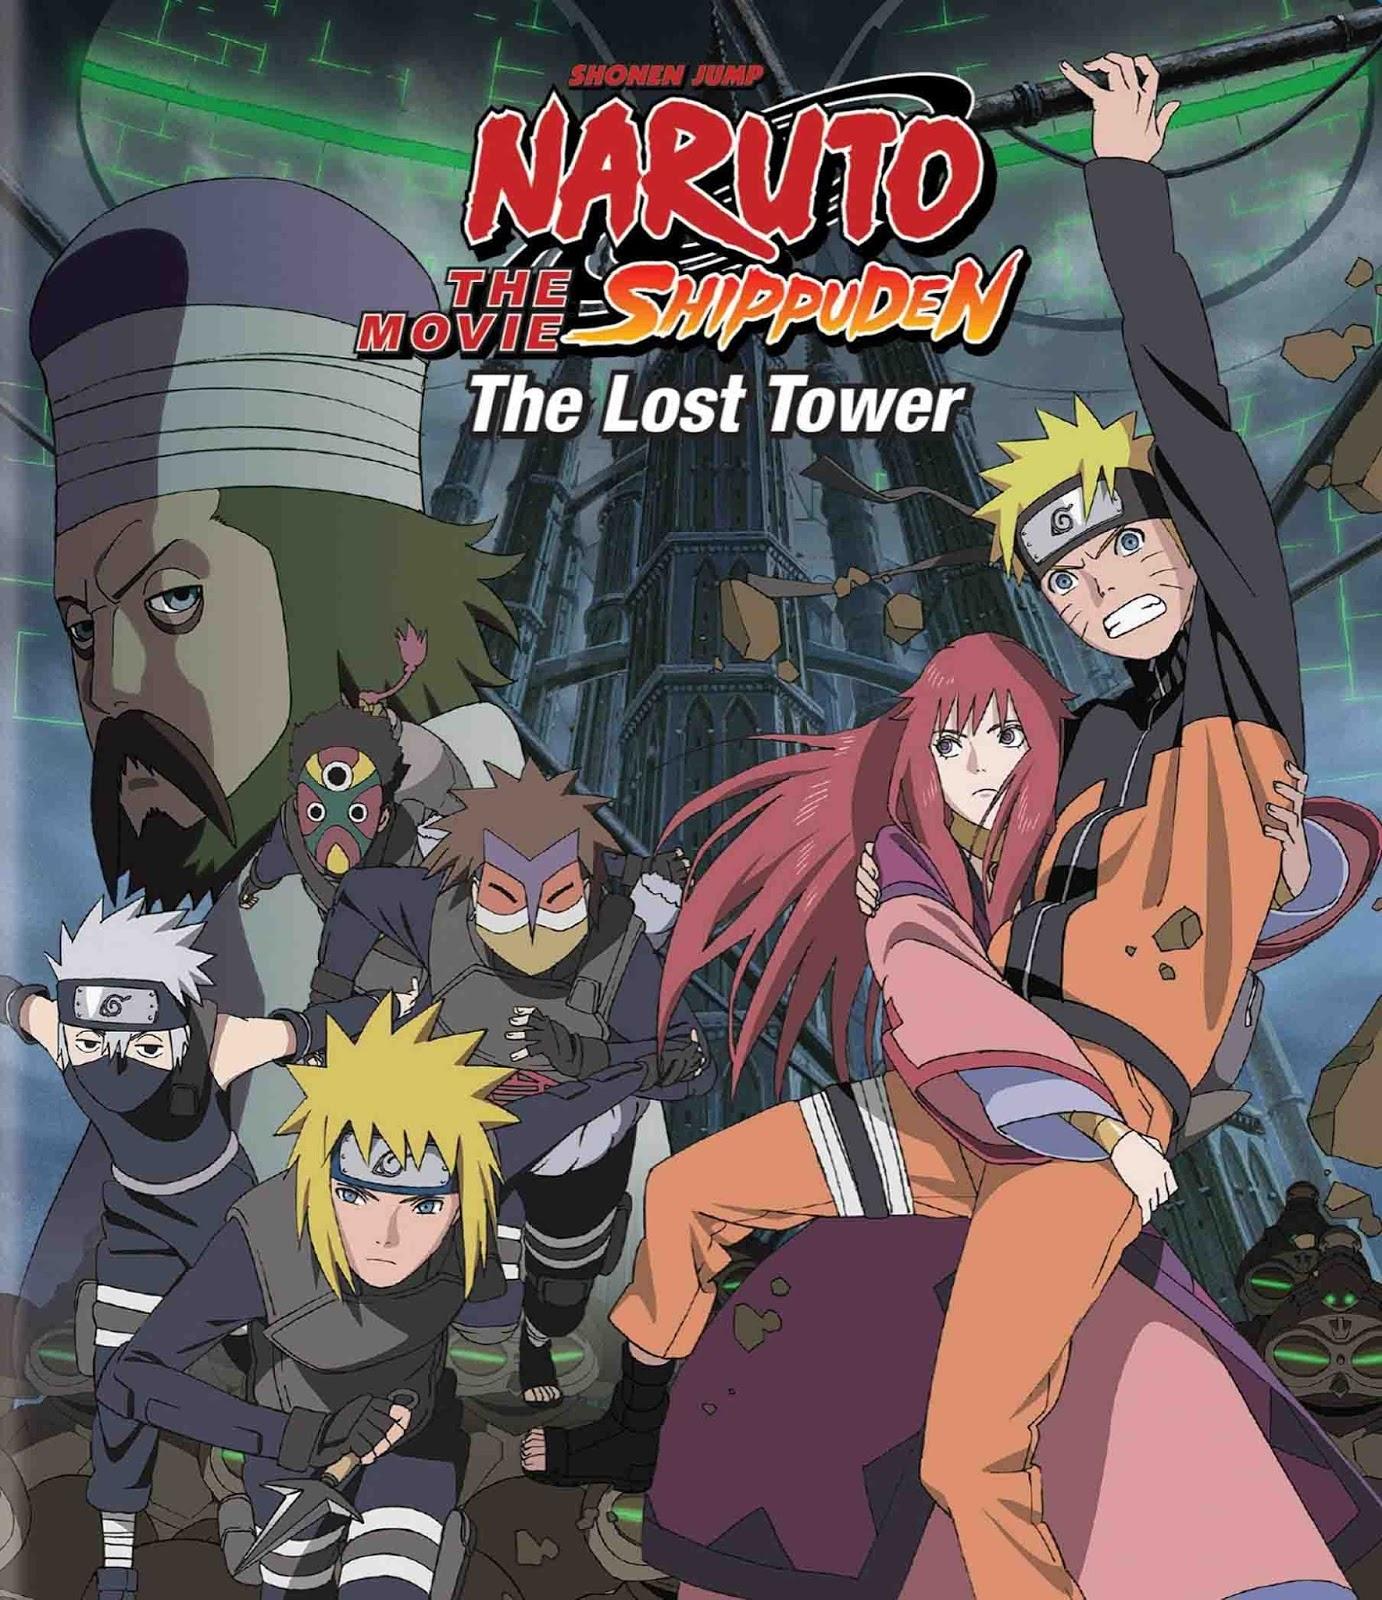 Naruto Shippuden Filme 4: Torre Perdida Torrent - Blu-ray Rip 1080p Legendado (2010)